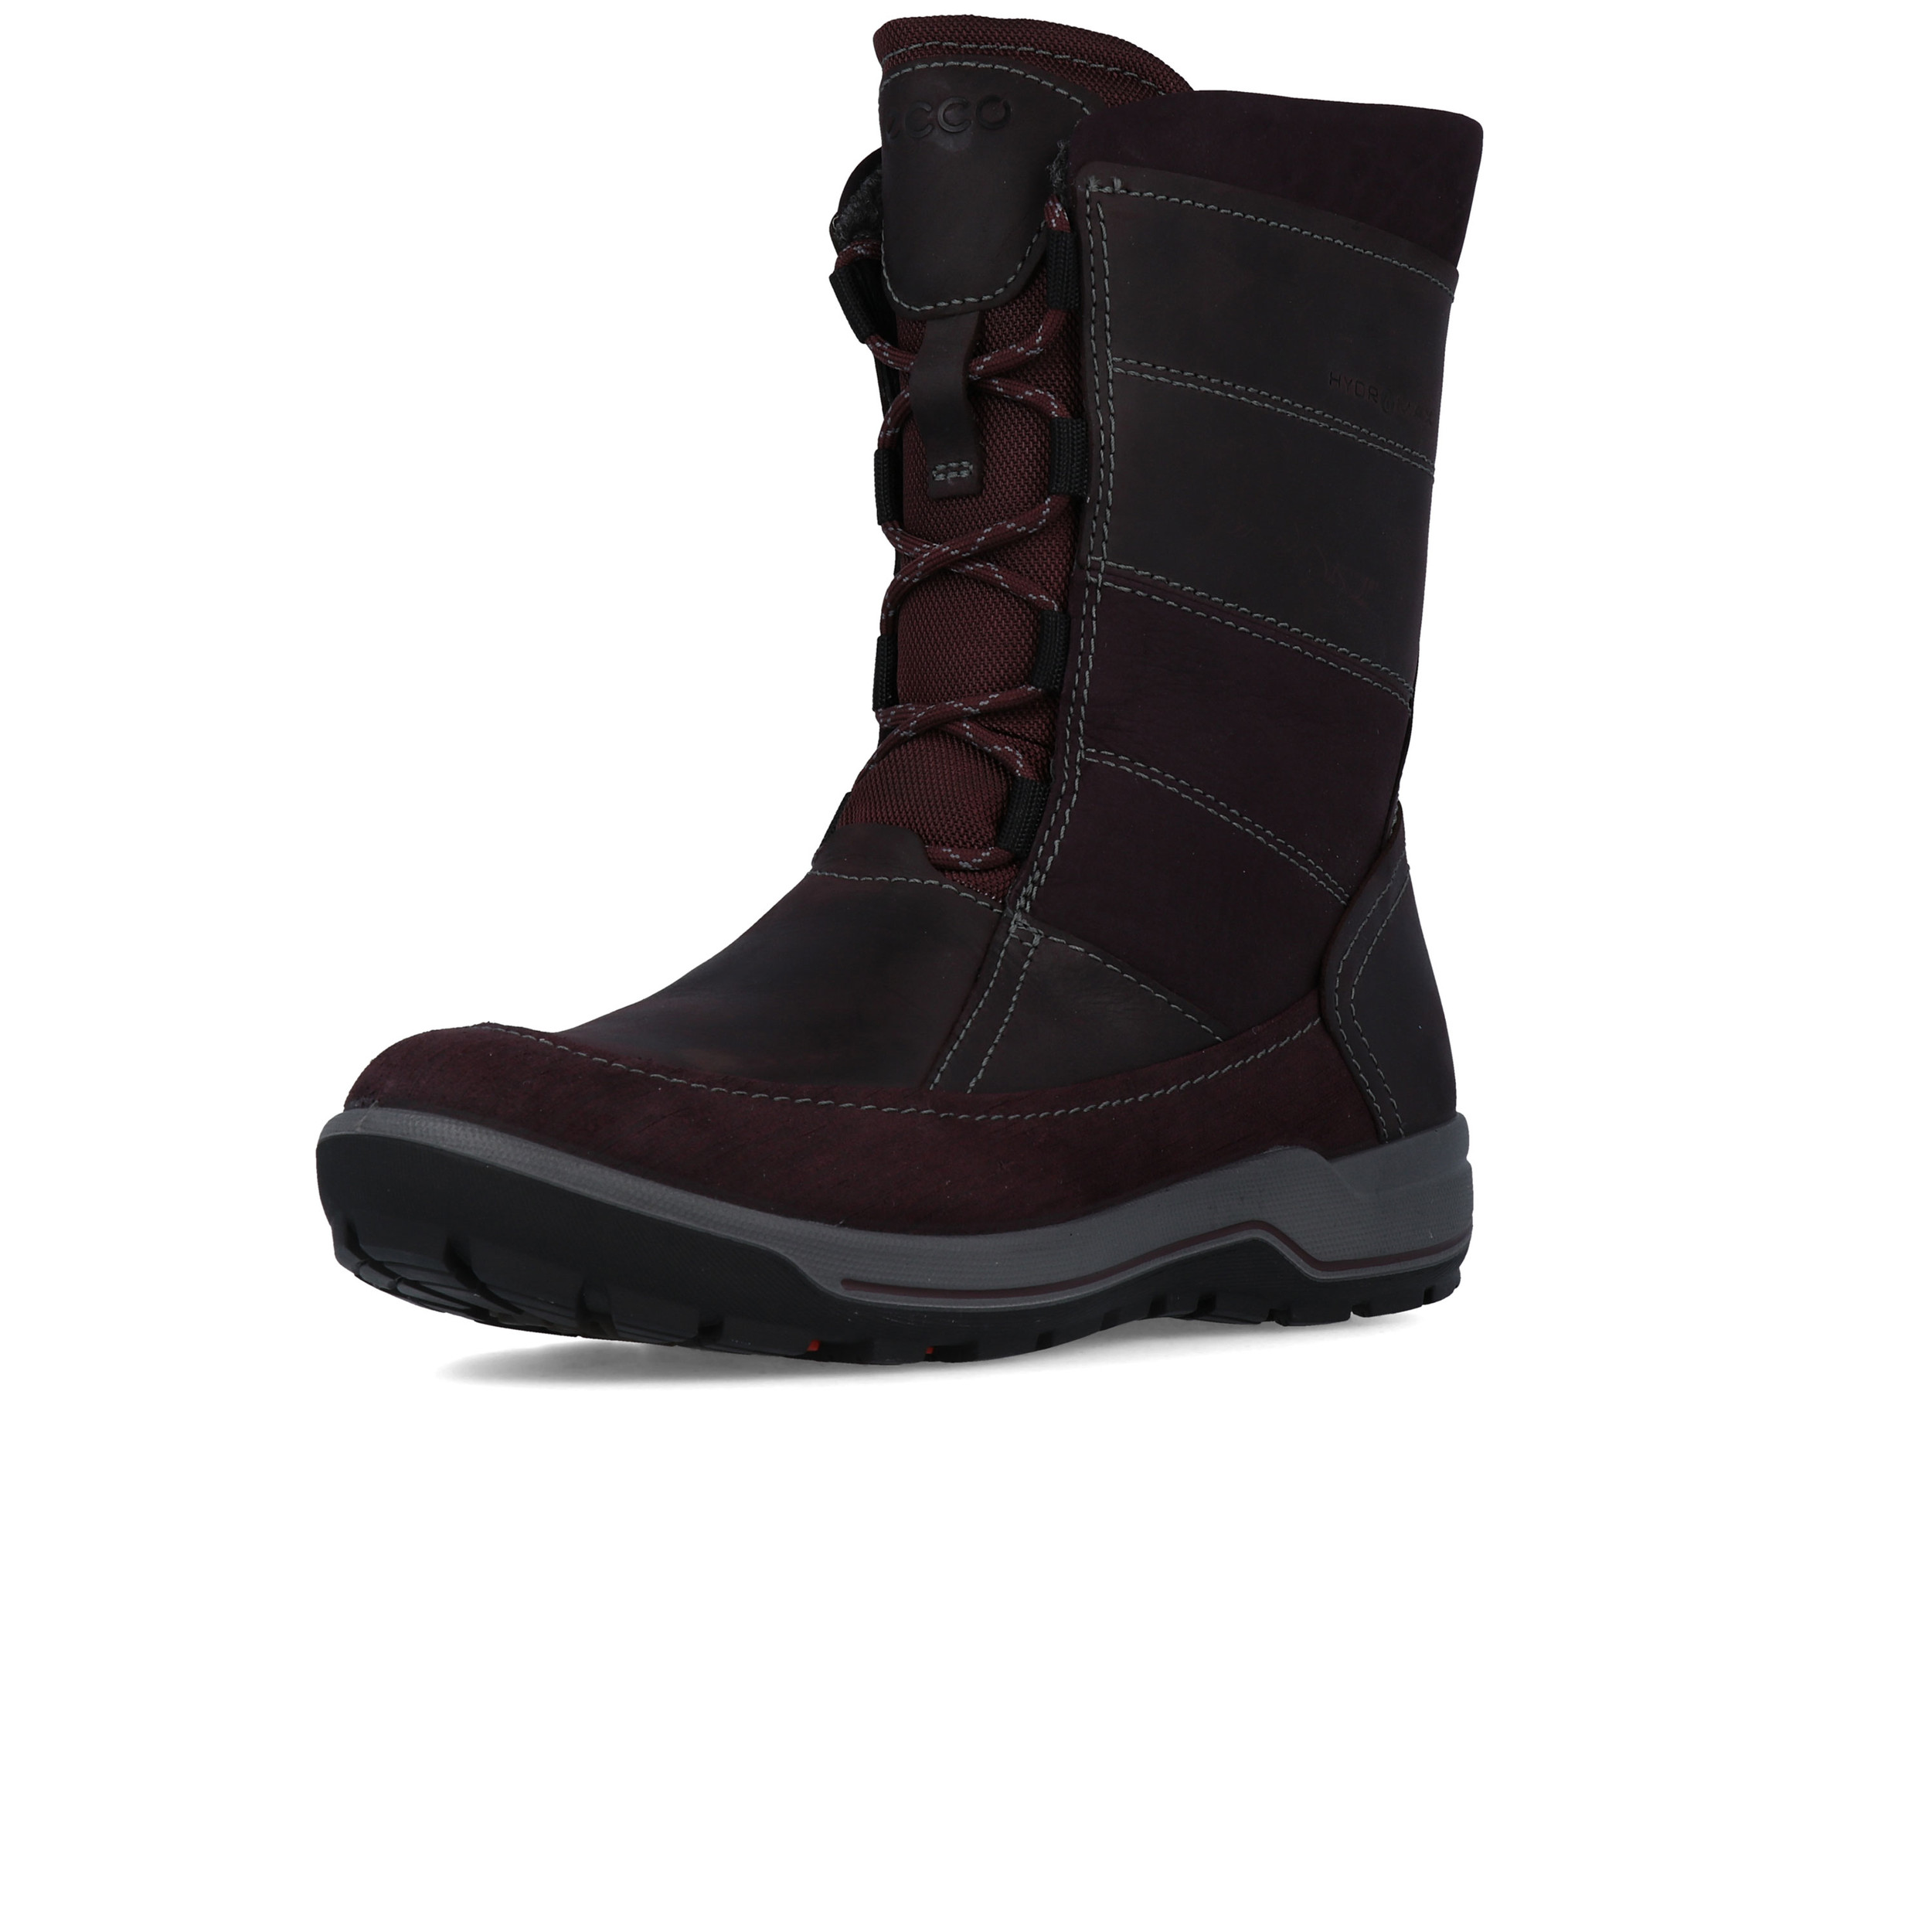 Details zu Ecco Damen Trace Lite Wanderschuhe Sportschuhe Outdoor Stiefel Schuhe Lila